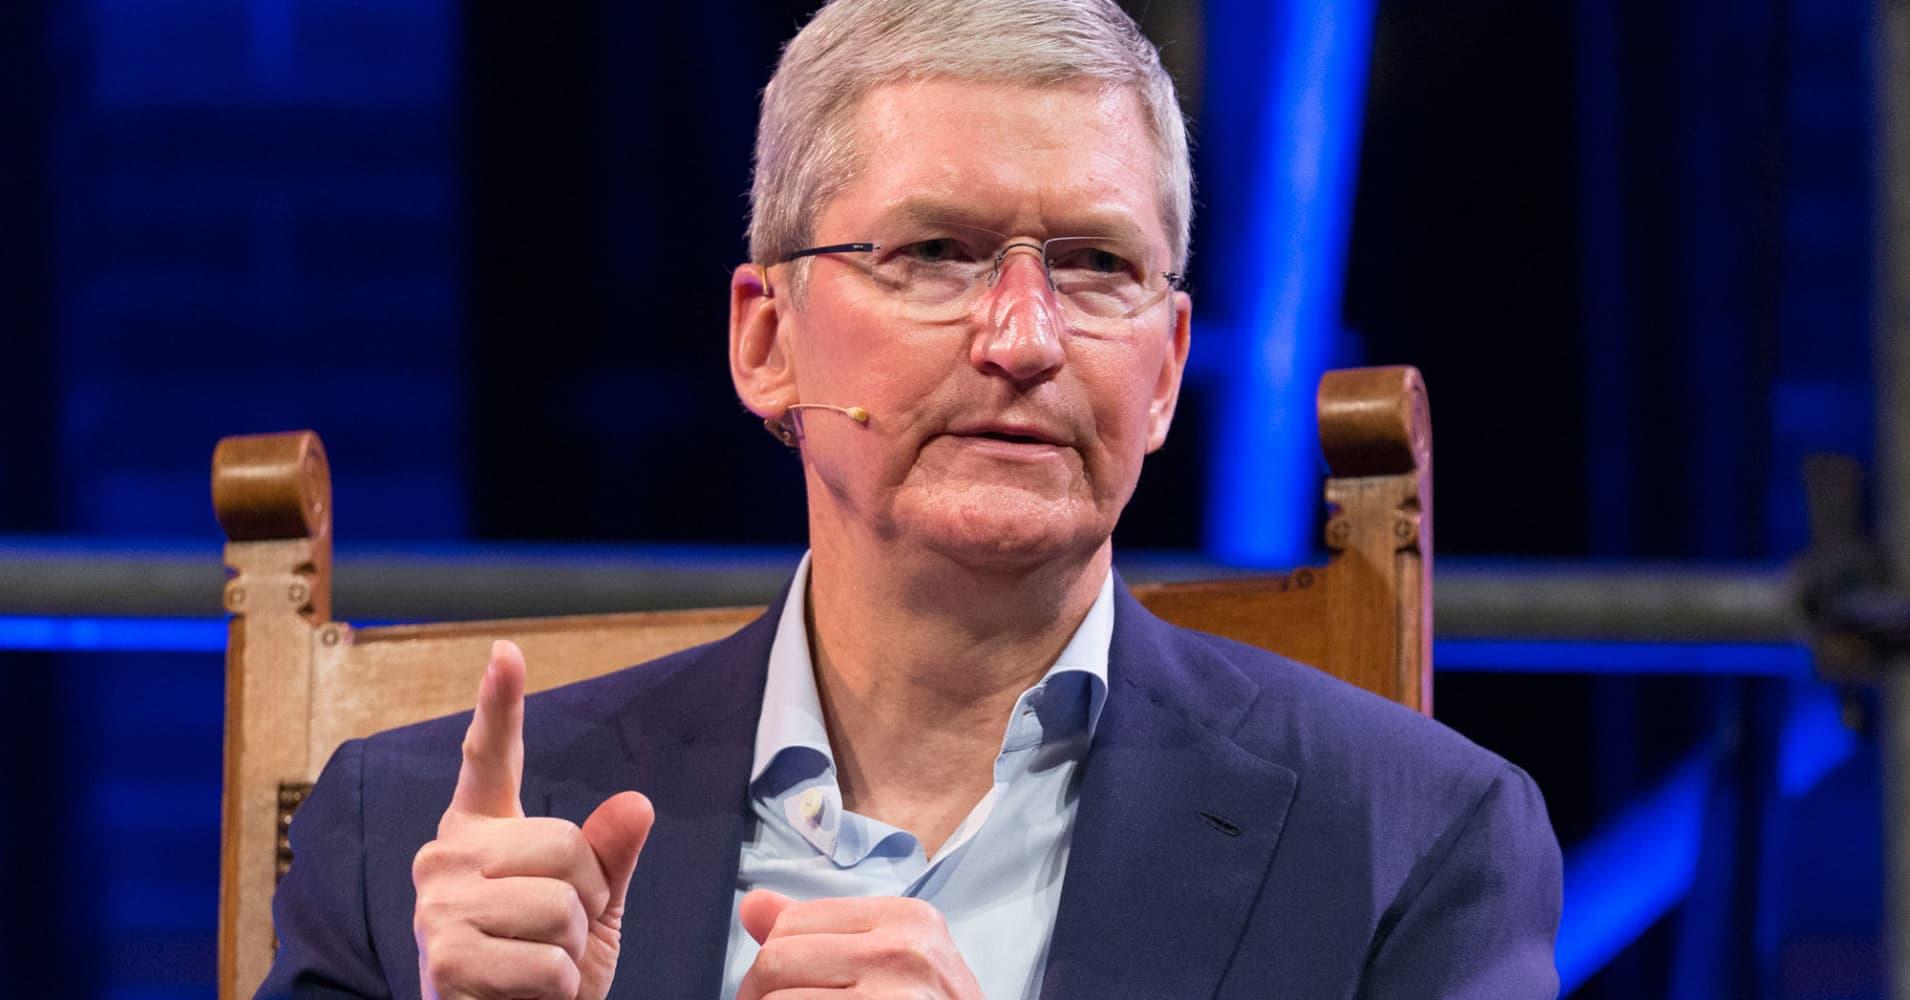 Apple, bellwether for technology stocks across Wall Street, falls into bear market territory